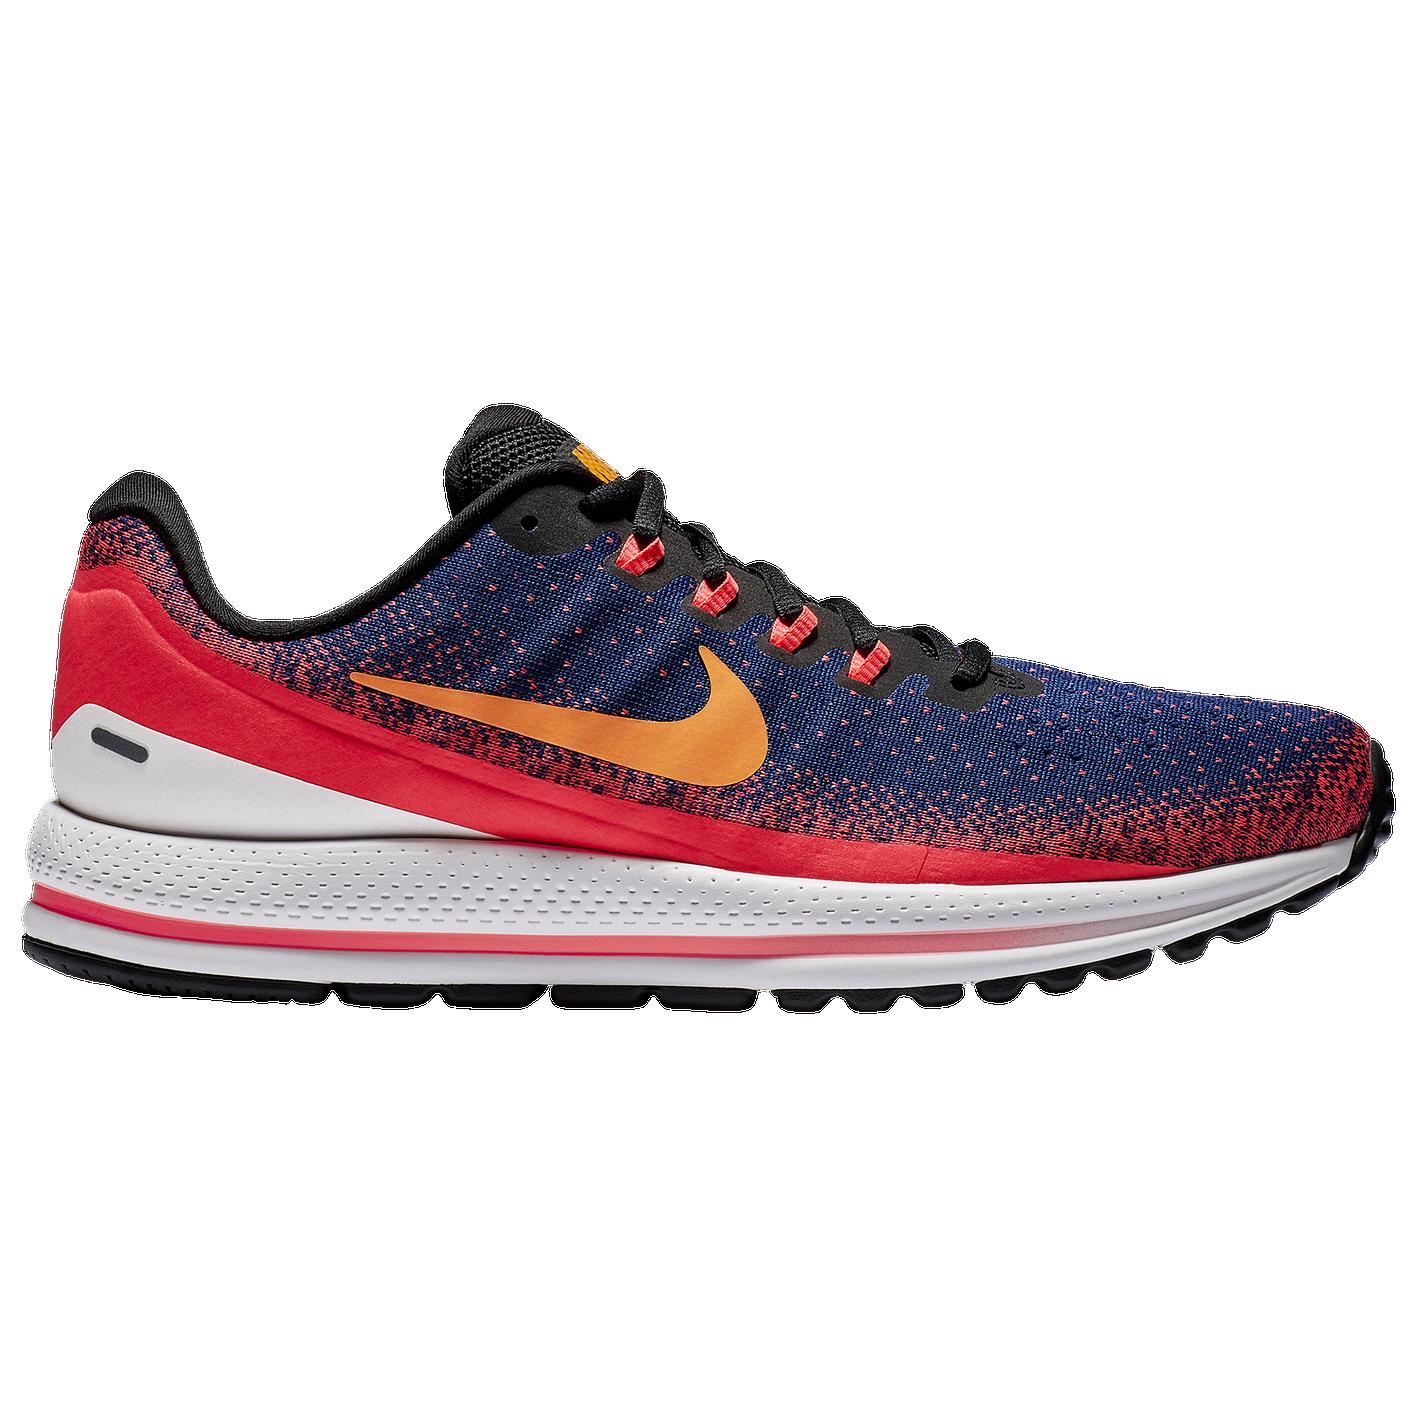 buy online 0633f 83404 Nike Air Zoom Vomero 13 - Men s